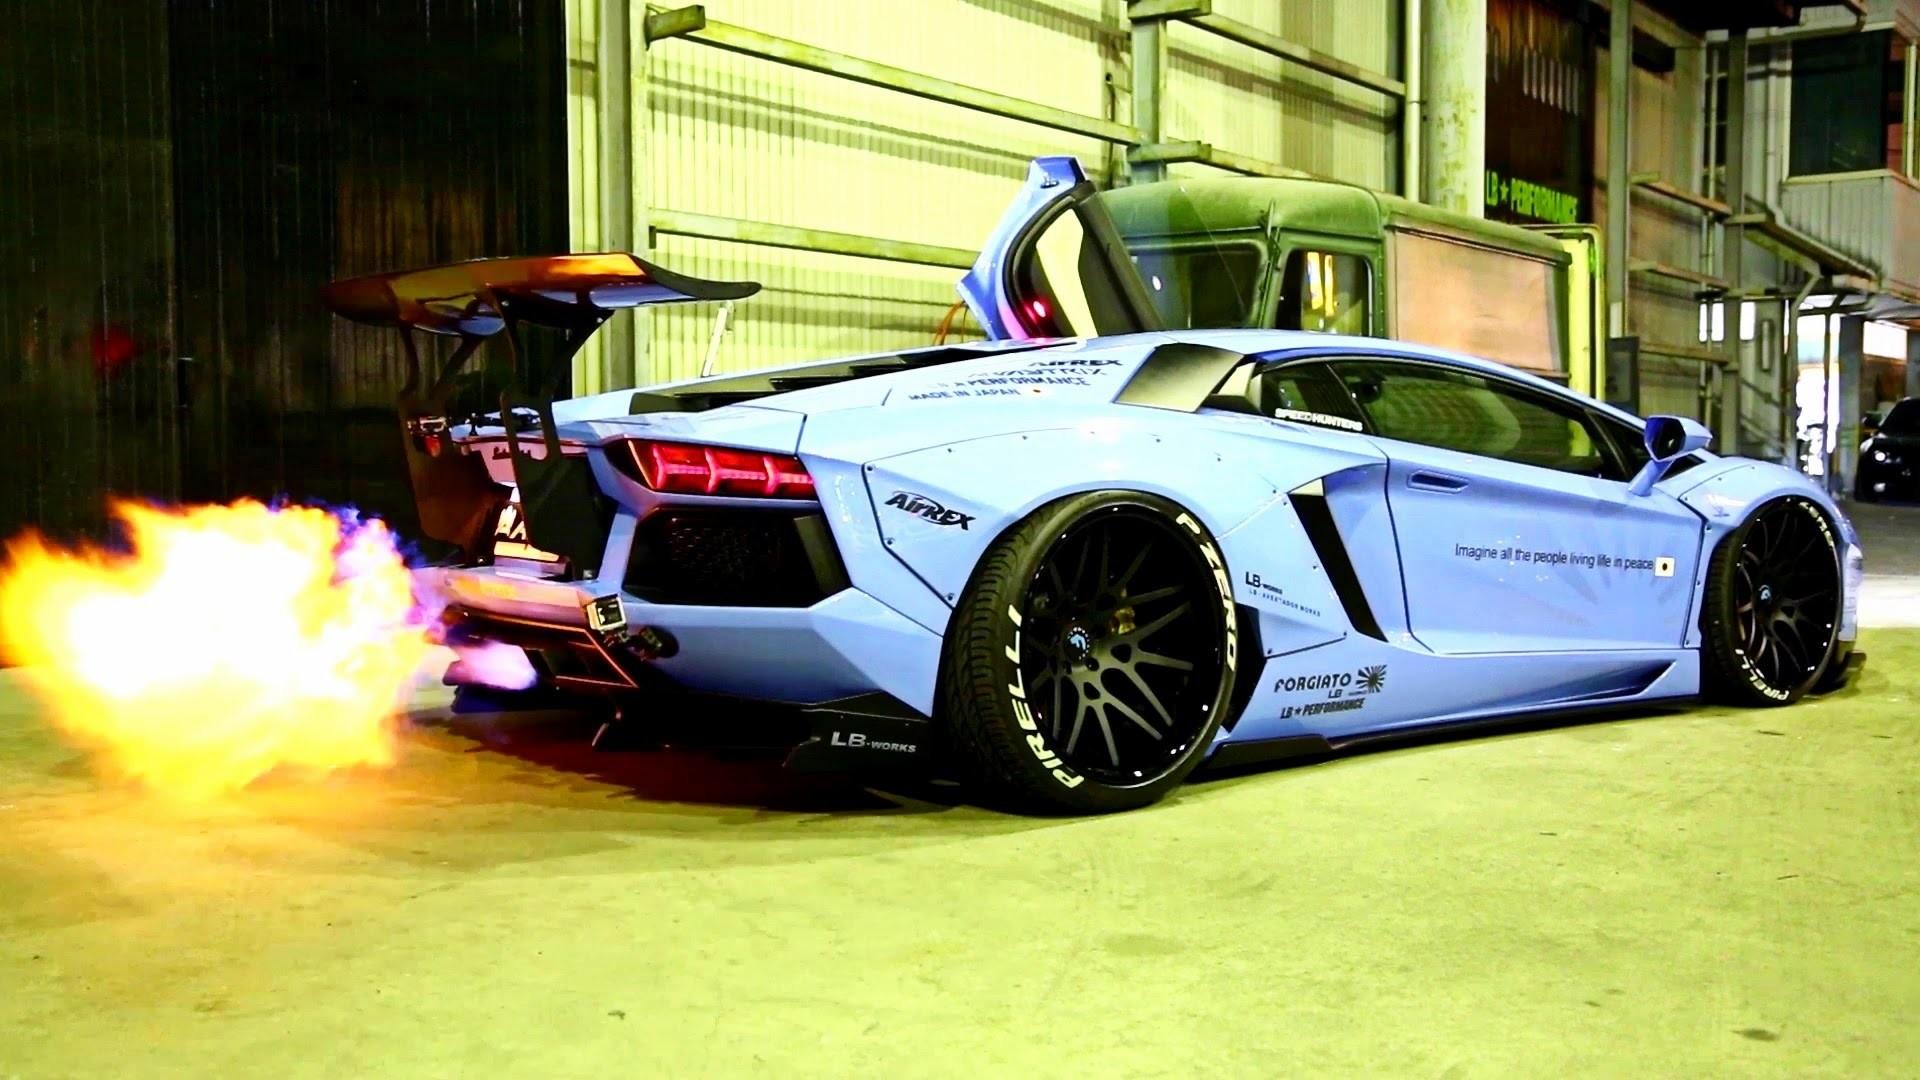 Insane Lamborghini Aventador Wallpapers | HD Wallpapers